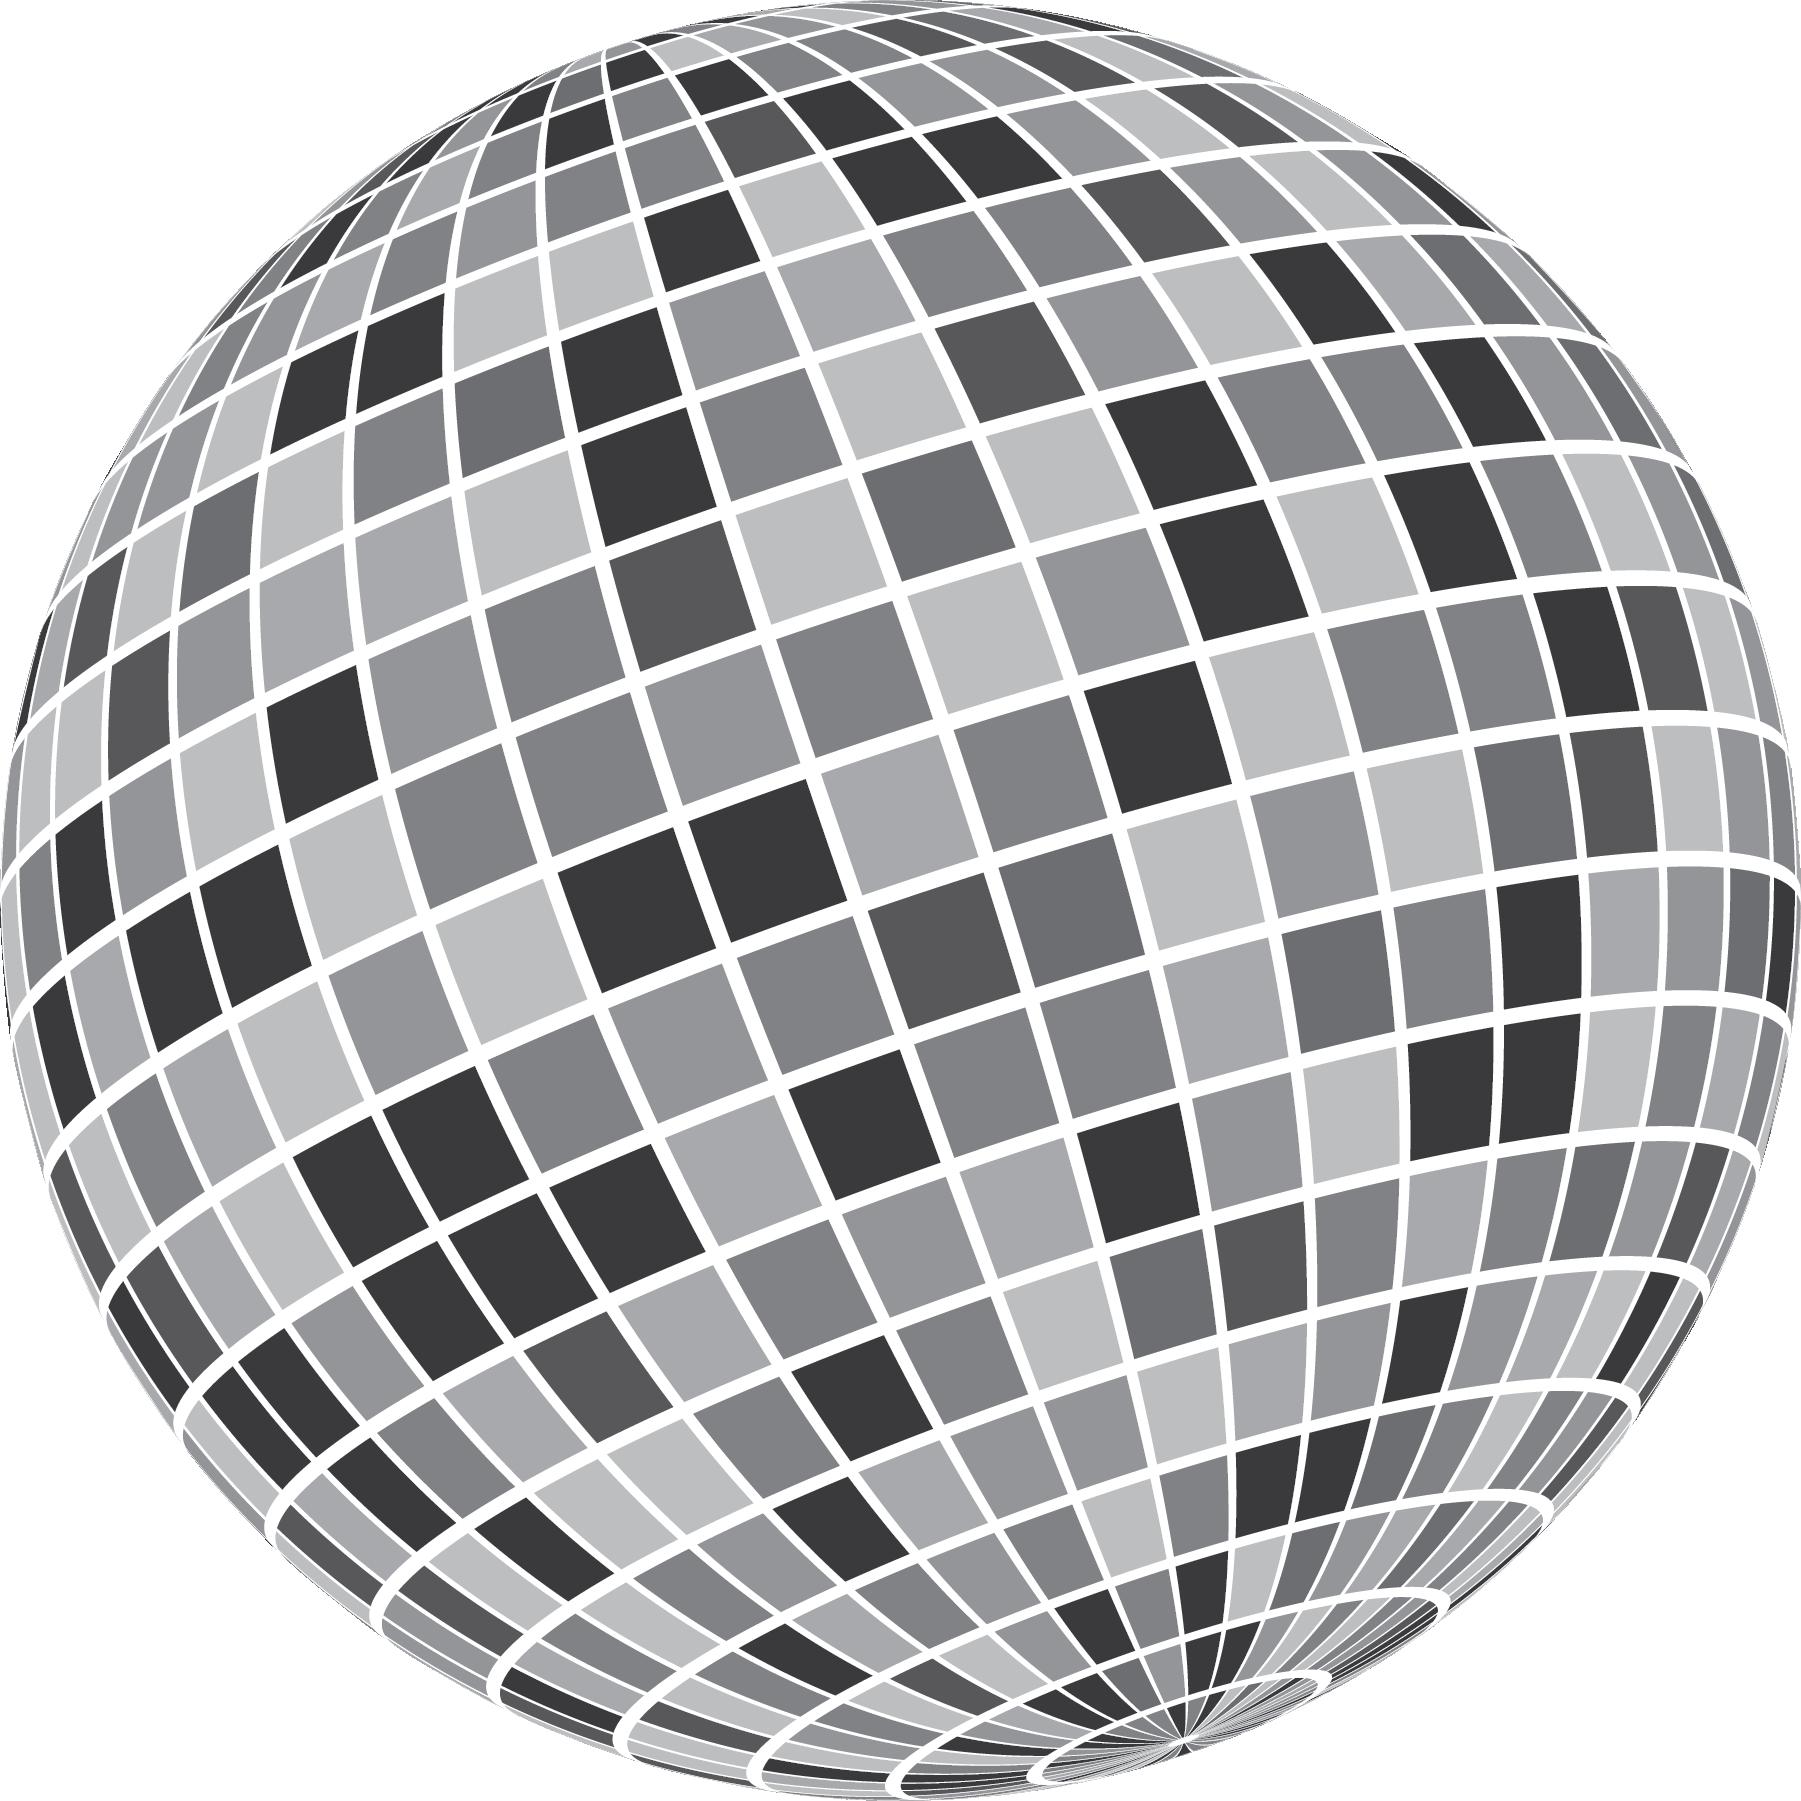 Disco clipart disco lights. Ball drawing ink pinterest